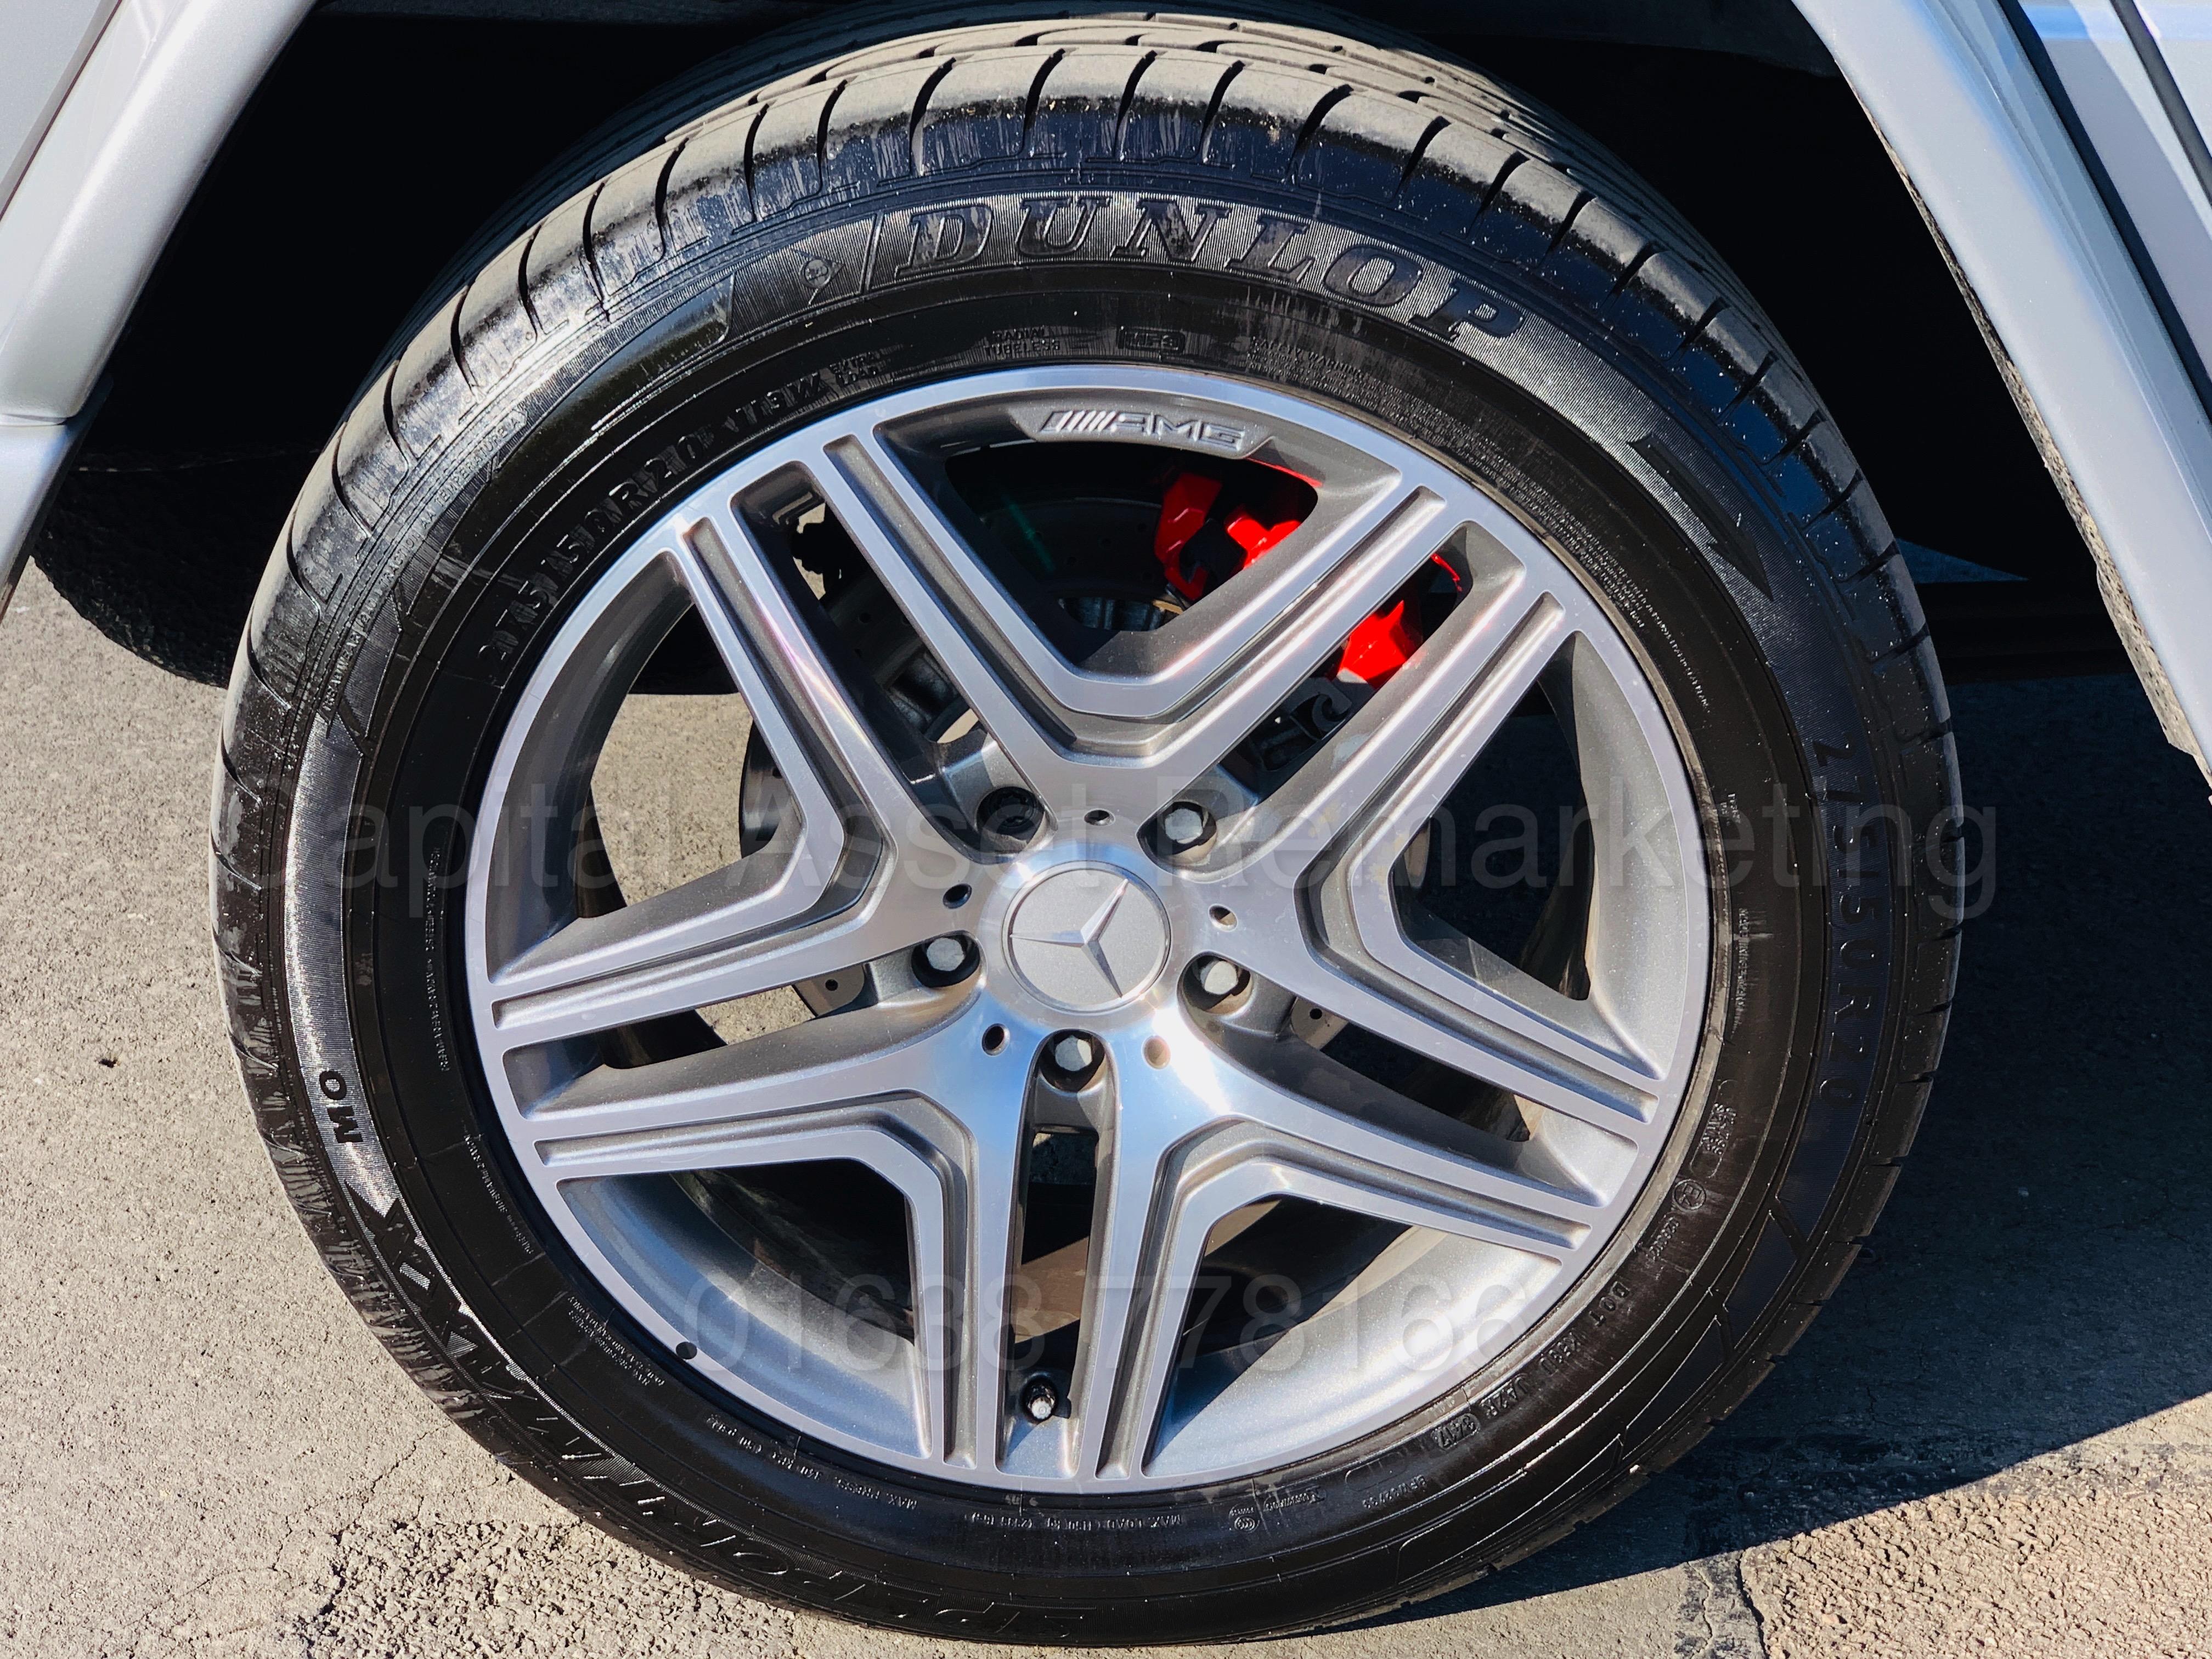 Lot 2 - (On Sale) MERCEDES-BENZ G63 AMG *4-MATIC* (2018) '5.5 V8 BI-TURBO - 572 BHP - AUTO' *AMAZING SPEC*